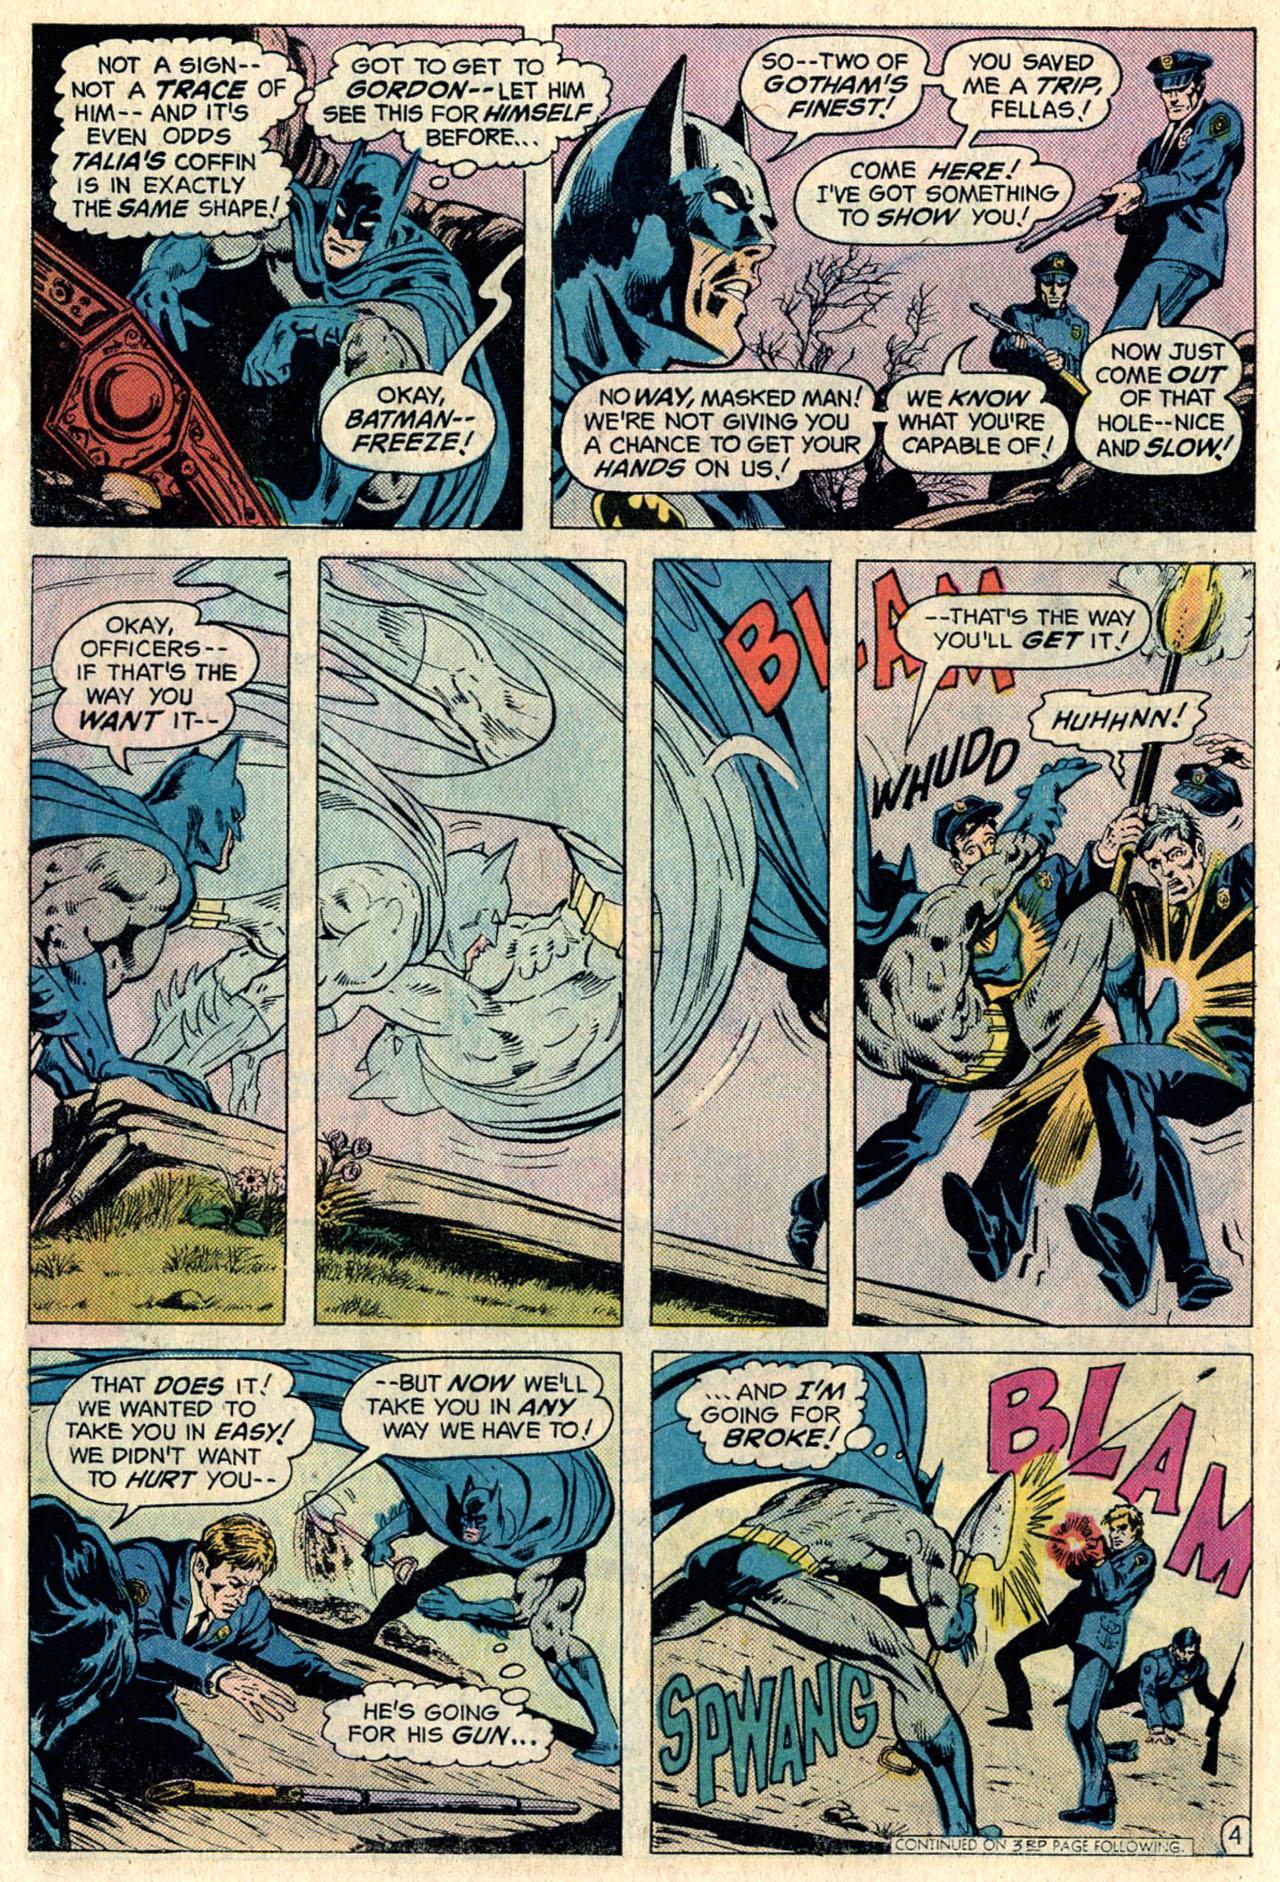 Detective Comics (1937) 447 Page 5